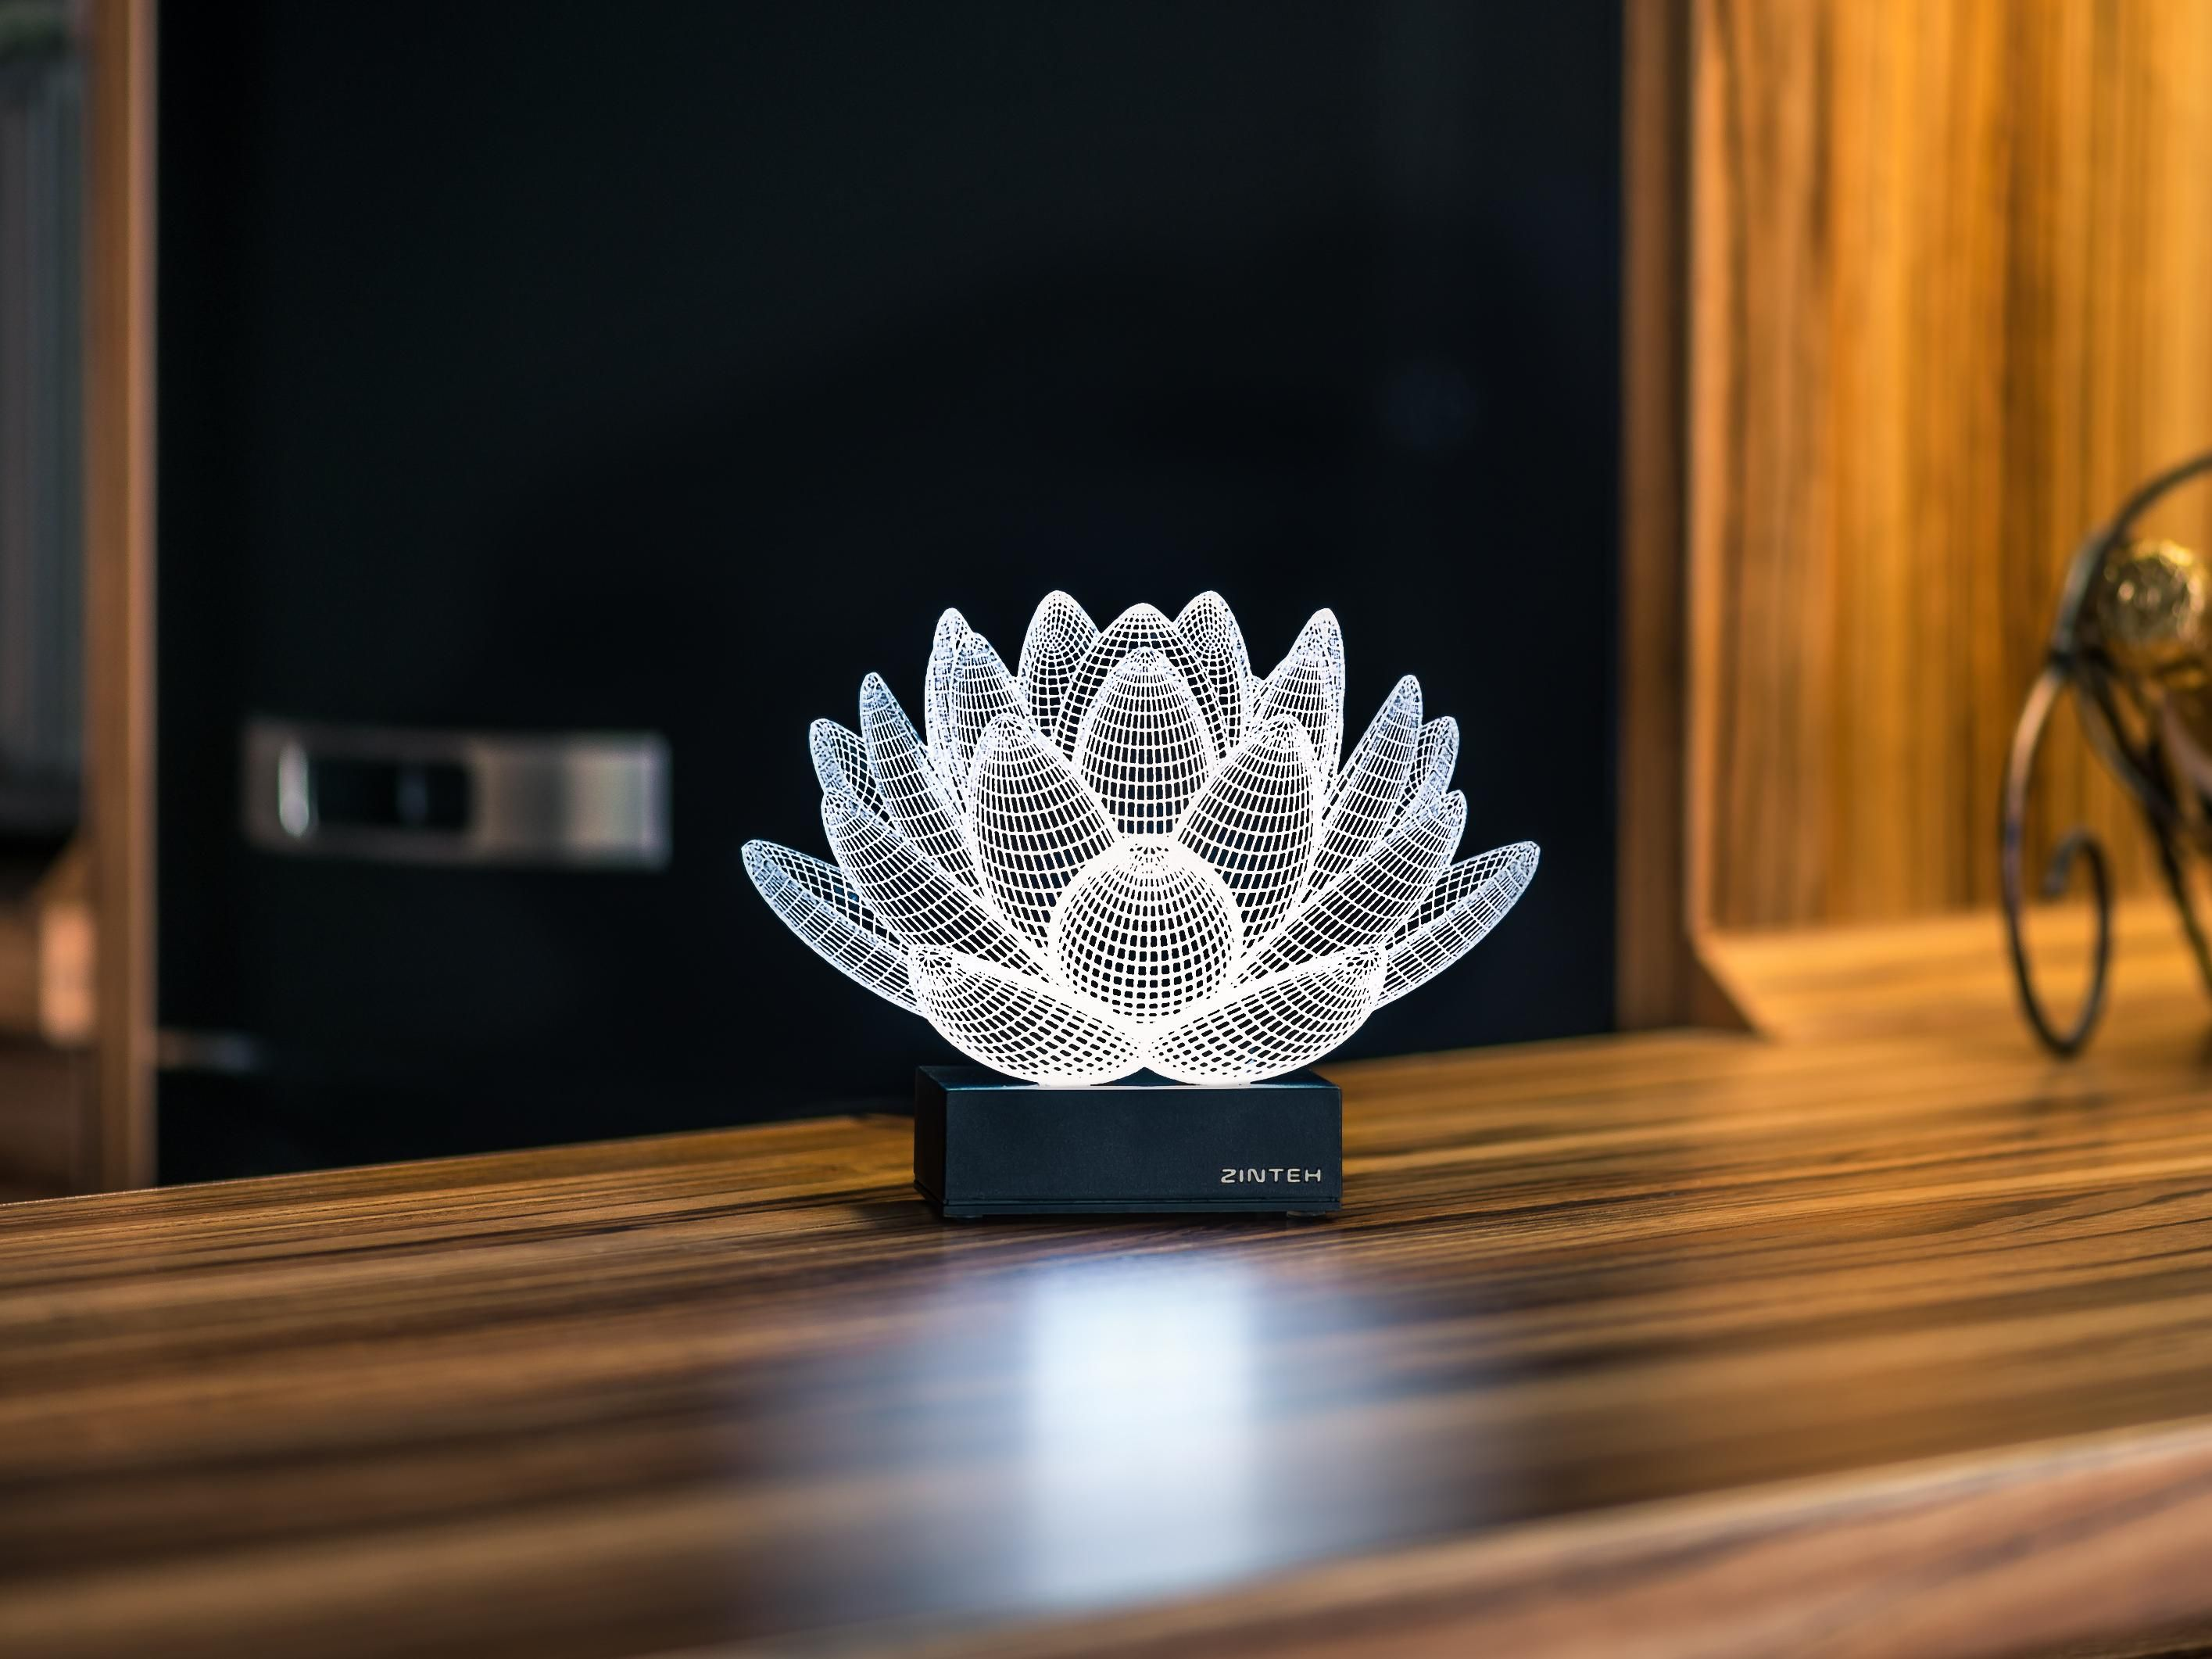 Lotus 3d Illusion Led Lamp Sovremennye Lampy Svetodiodnaya Lampa Dizajn Sveta